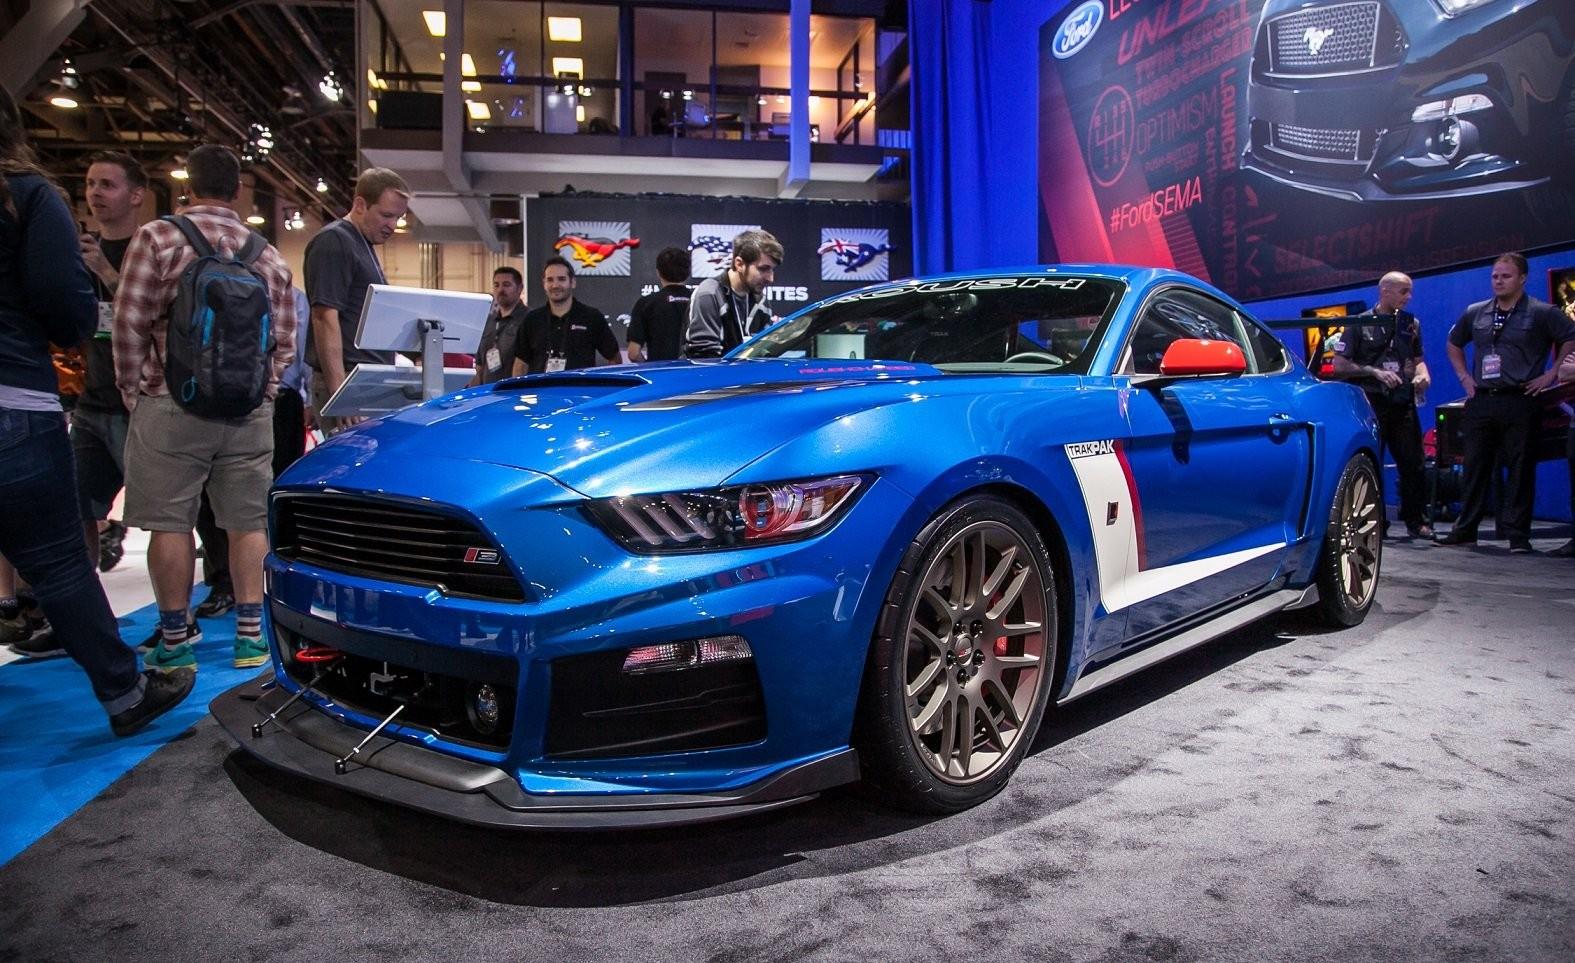 Roush представил тюнингованный Ford Mustang с 850 л.